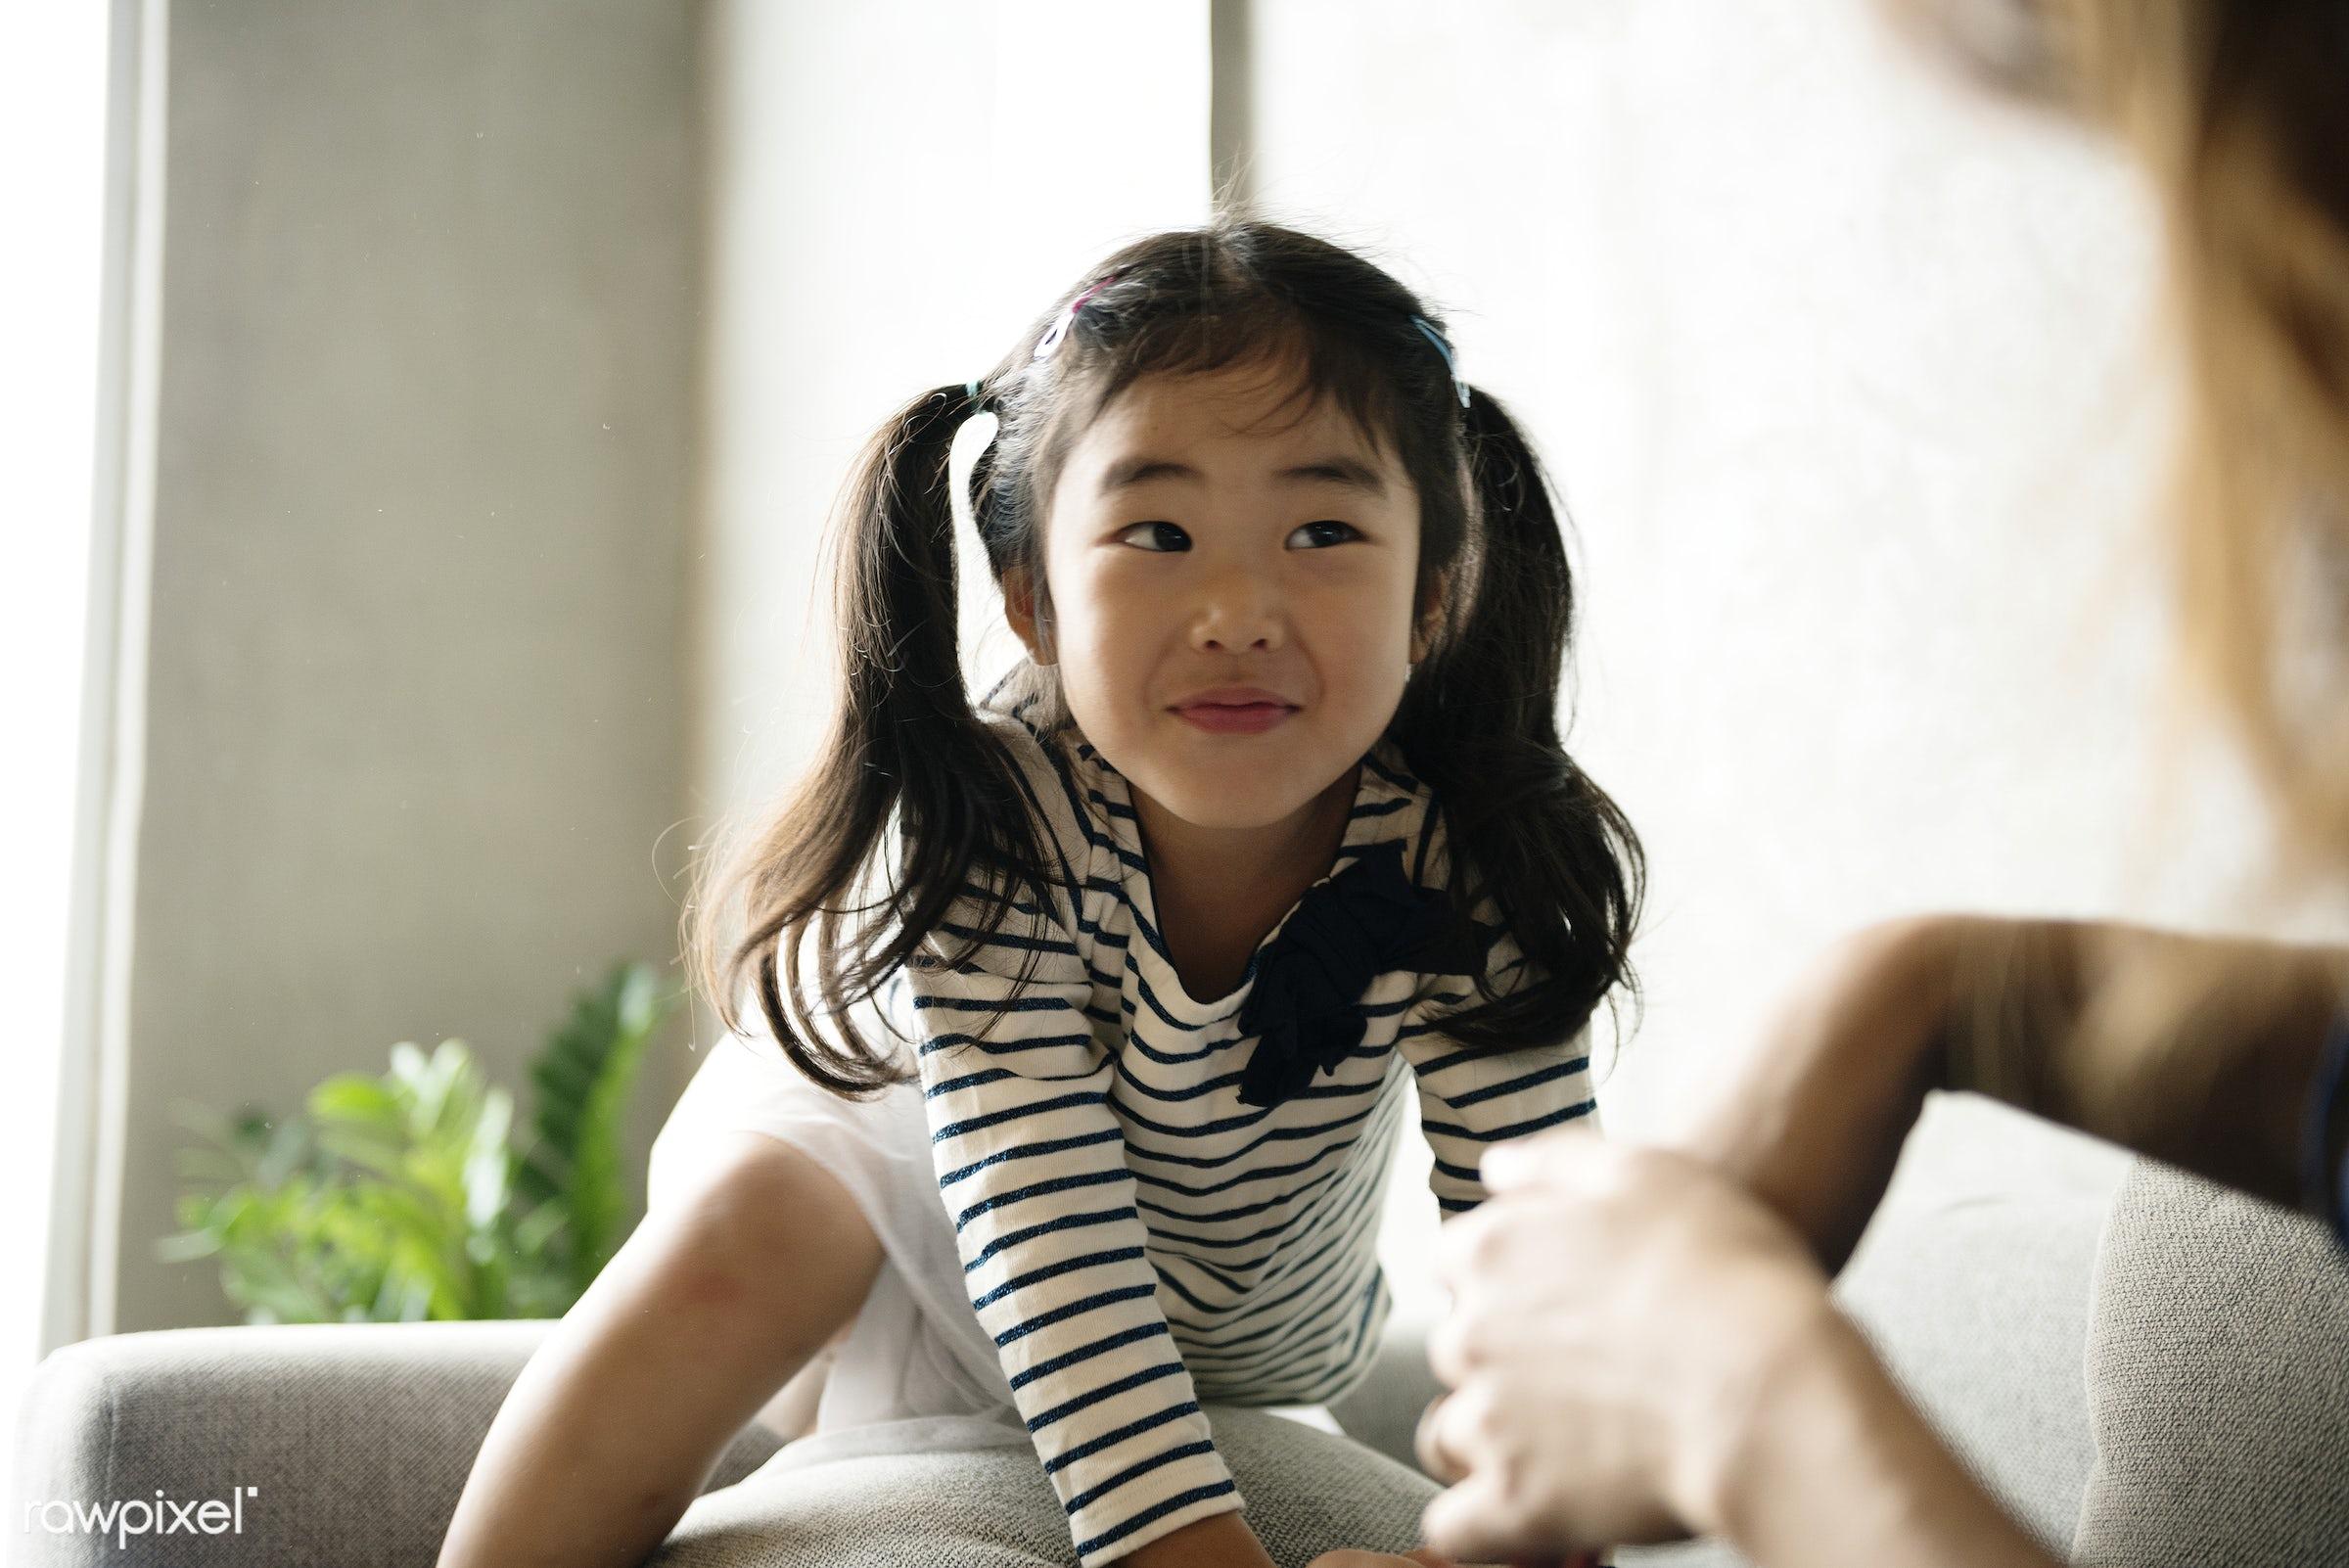 Cheerful japanese girl - asia, asian, bonding, casual, child, childhood, daughter, family, girl, happiness, japan, japanese...